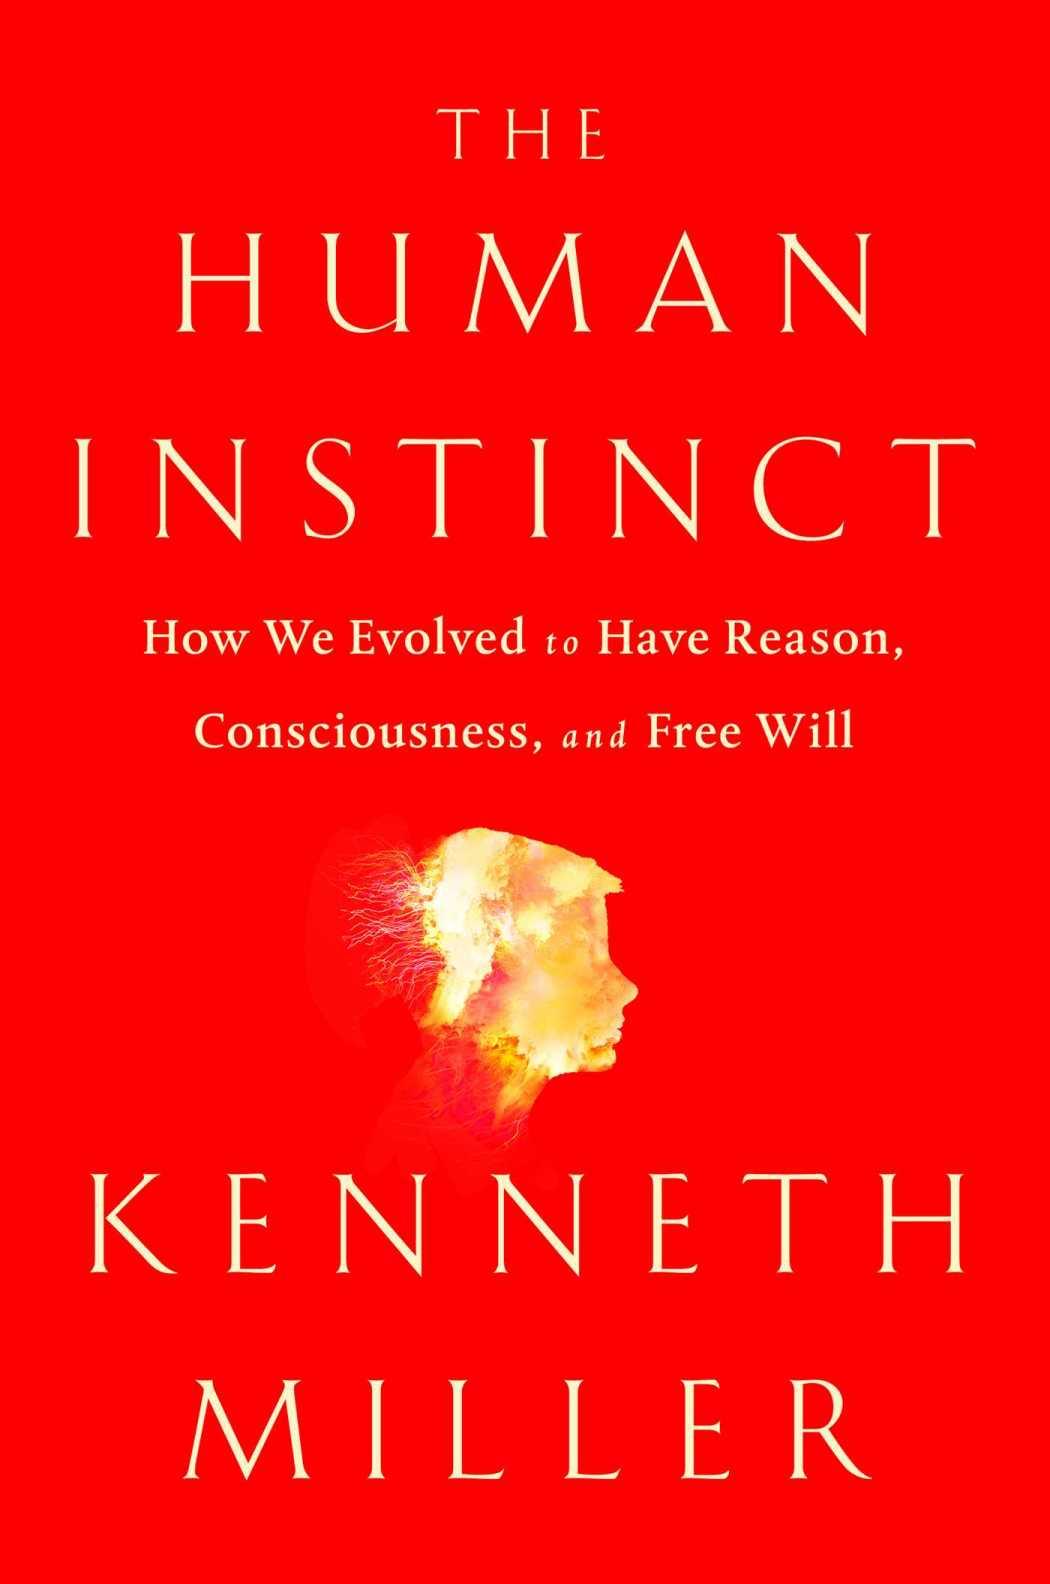 the-human-instinct-9781476790268_hr